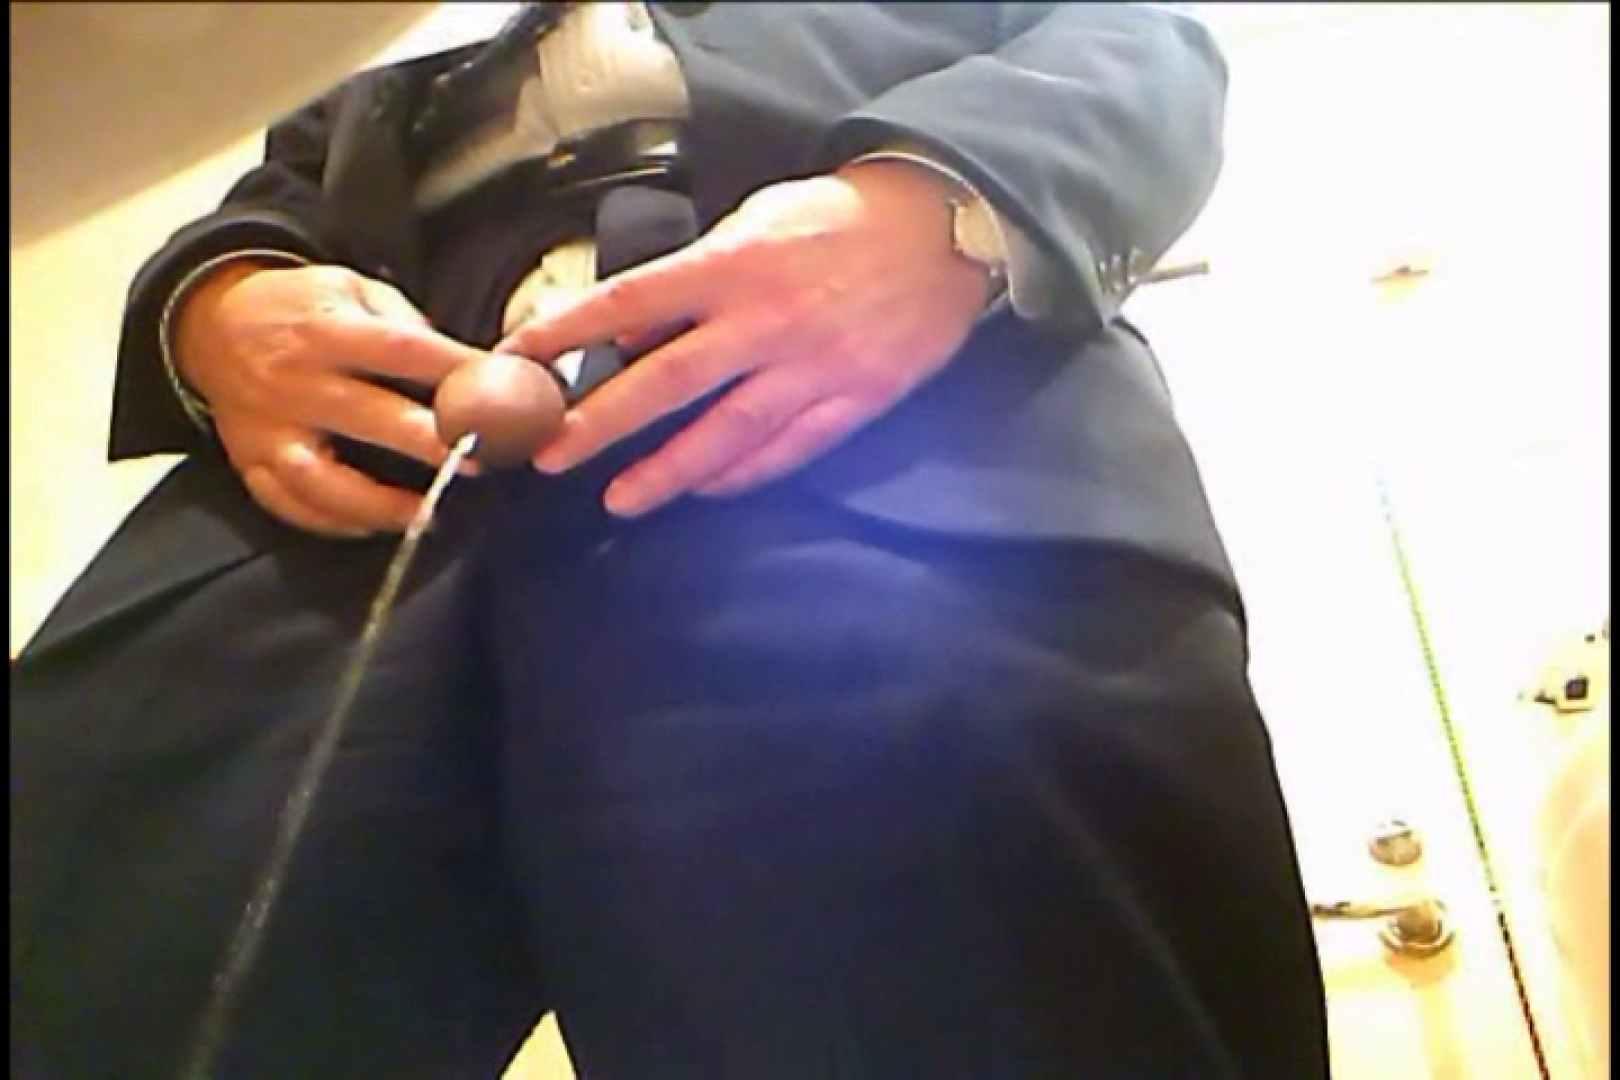 Gボーイ初投稿!掴み取りさんの洗面所覗き!in新幹線!VOL.05 投稿 ゲイエロ動画 96枚 43